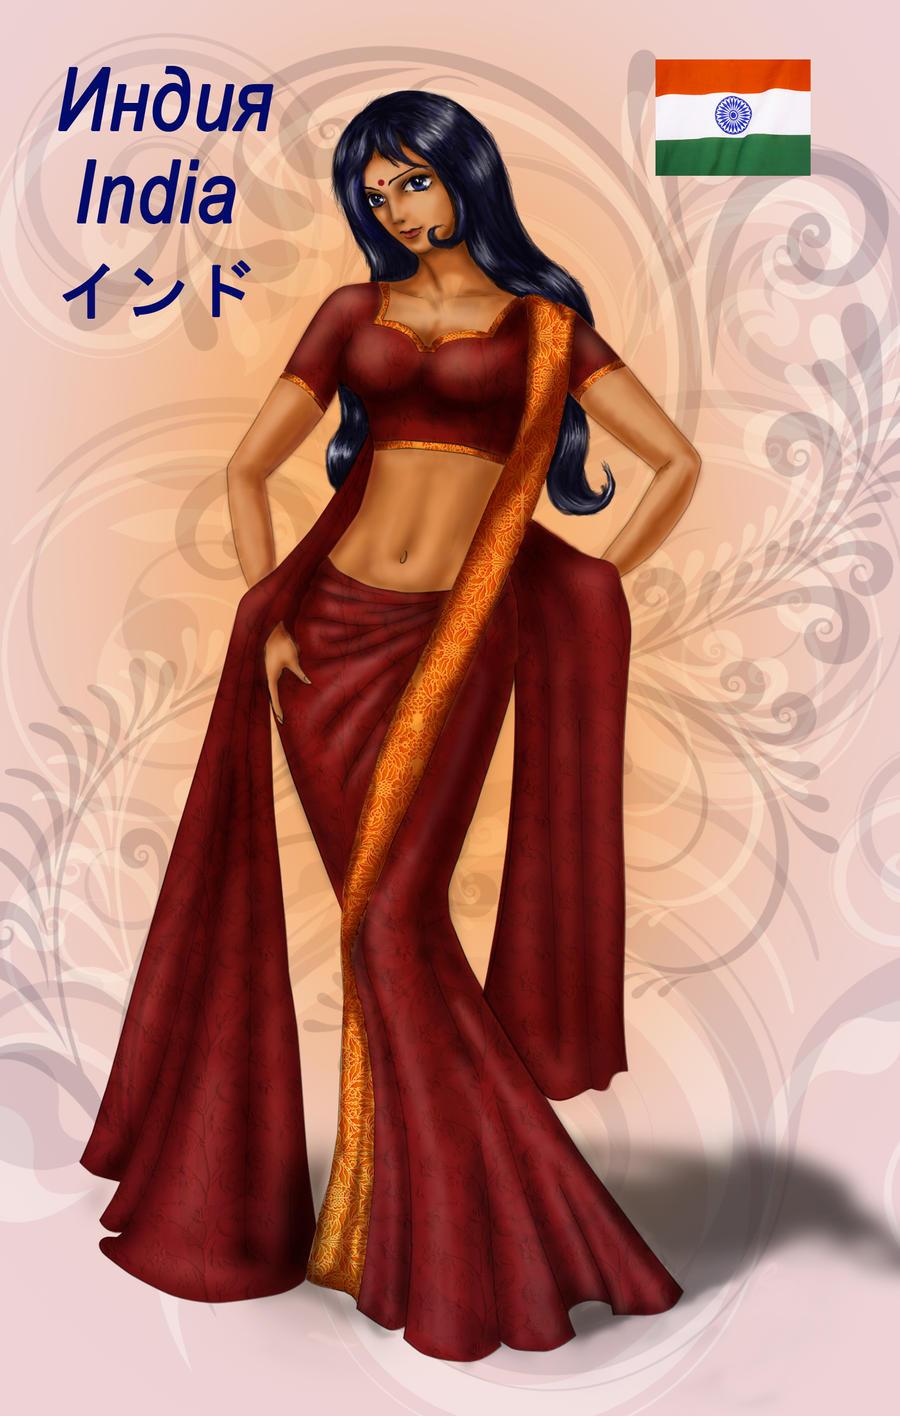 India by Keylali